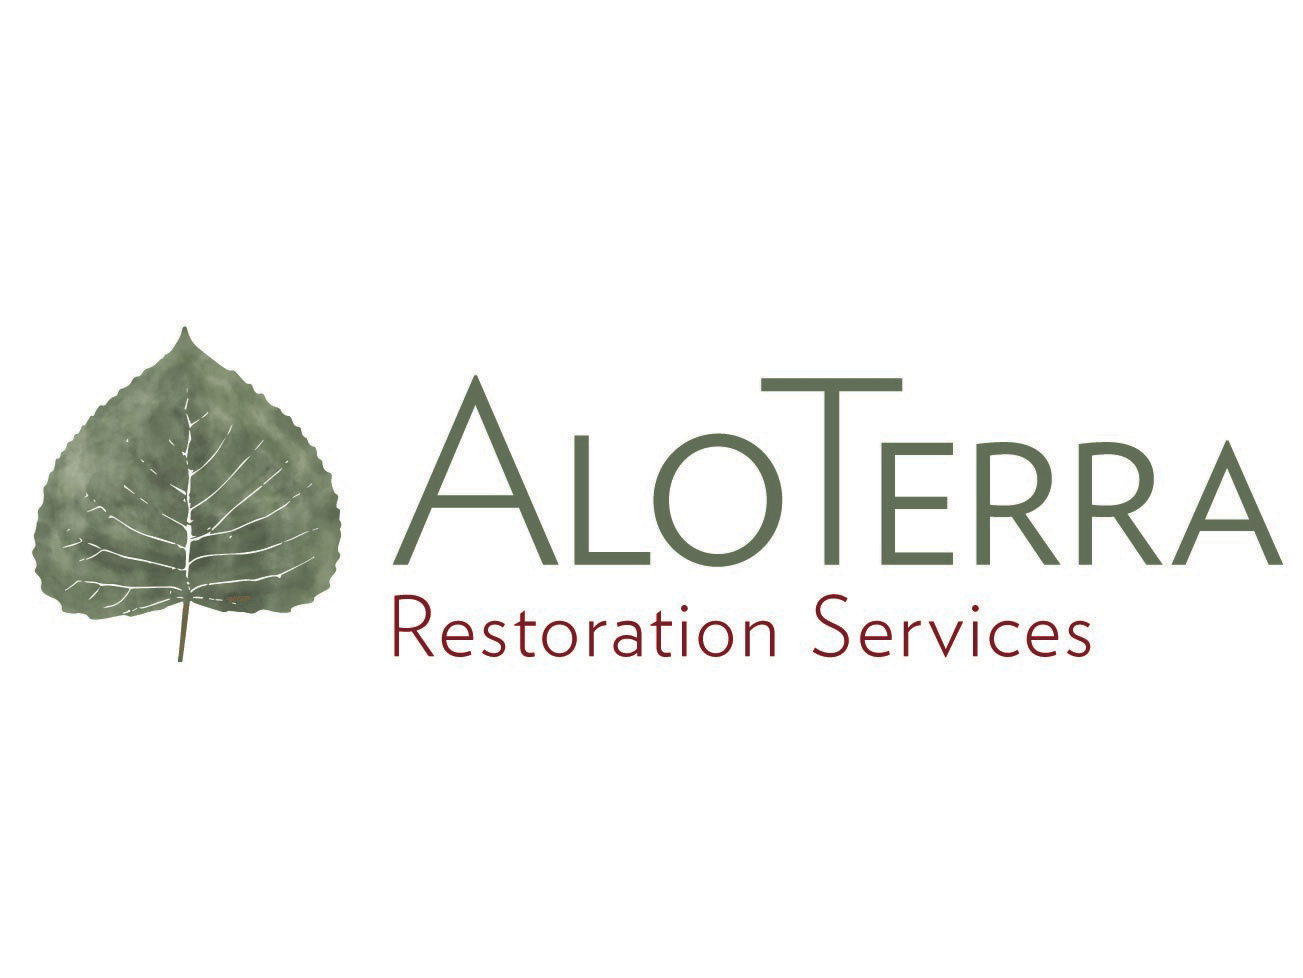 AloTerra Restoration Services